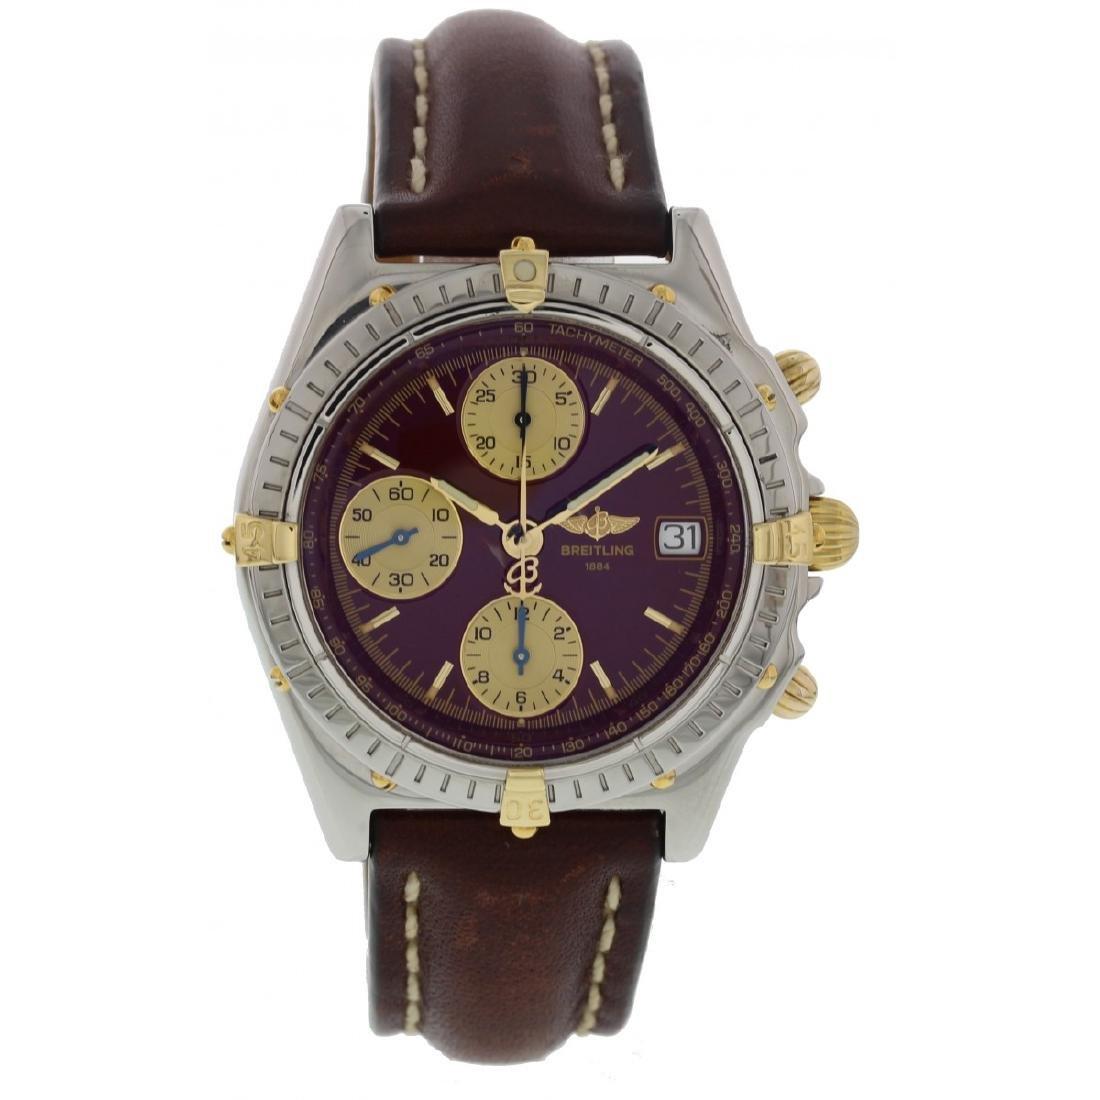 Breitling Chronomat B13050 1 Automatic Watch